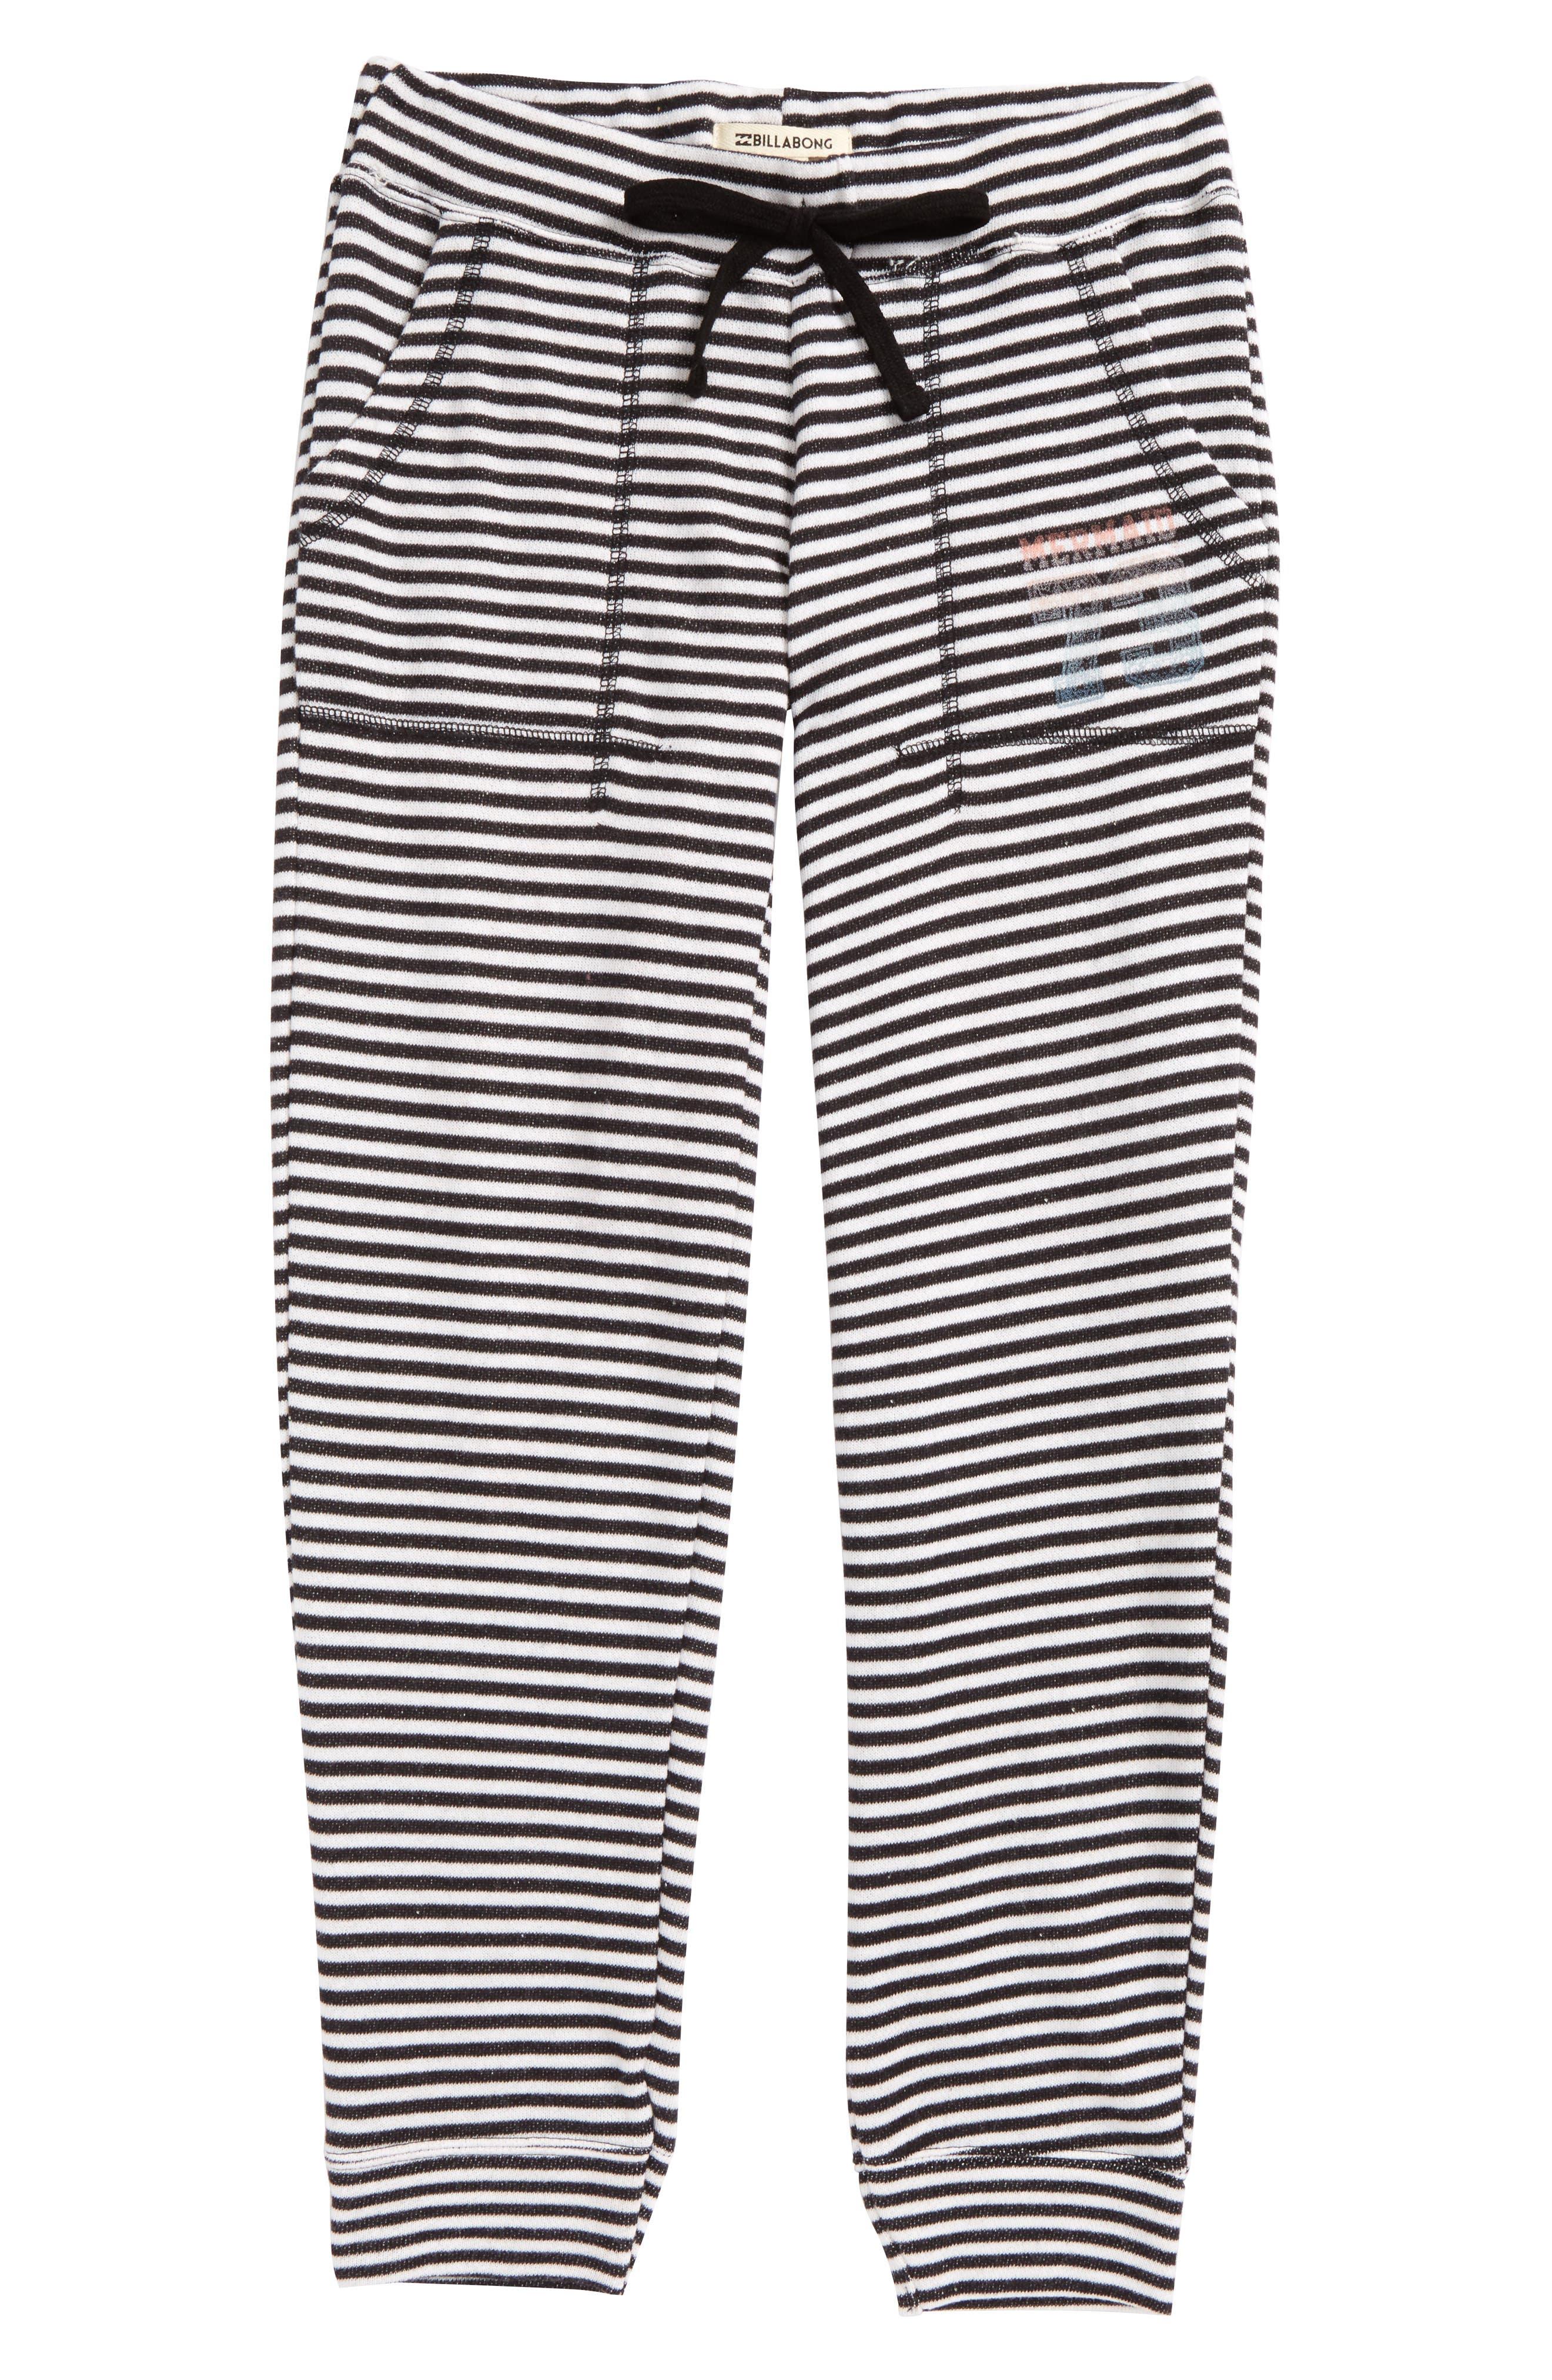 Safe Love Knit Pants,                         Main,                         color, Black